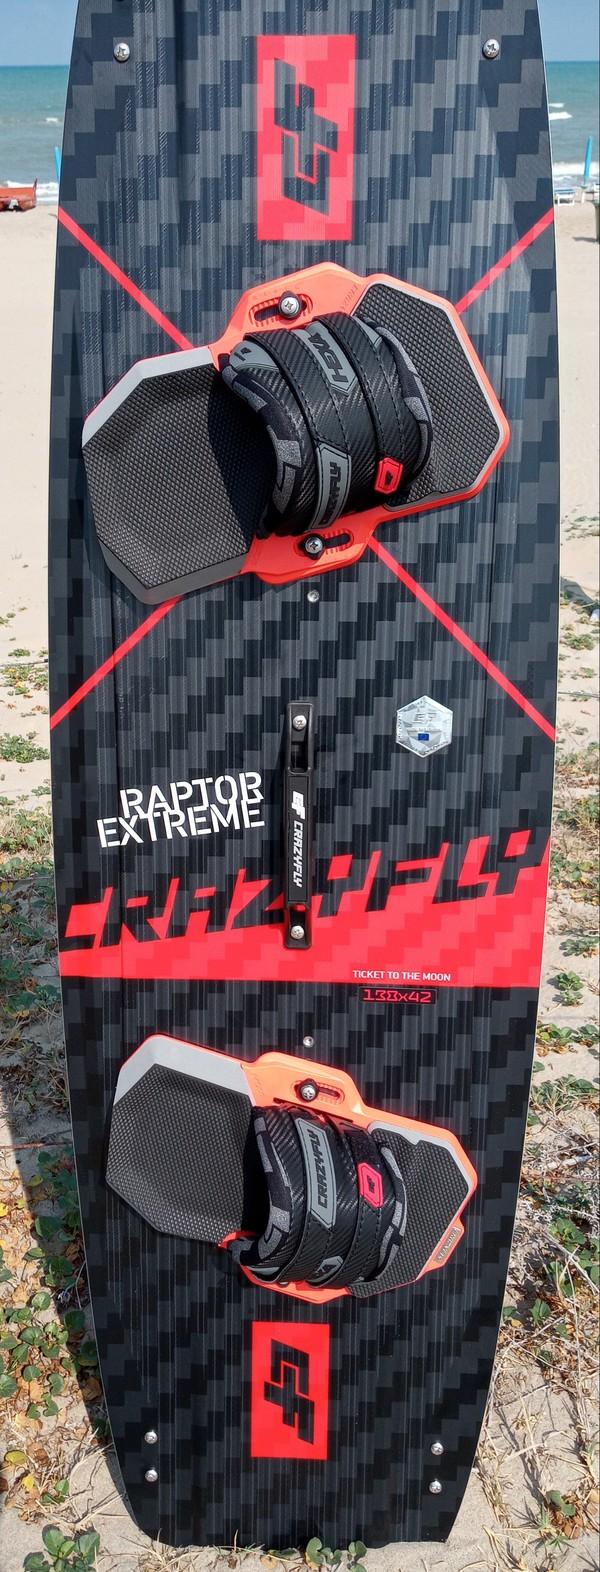 Crazyfly - RAPTOR EXTREME